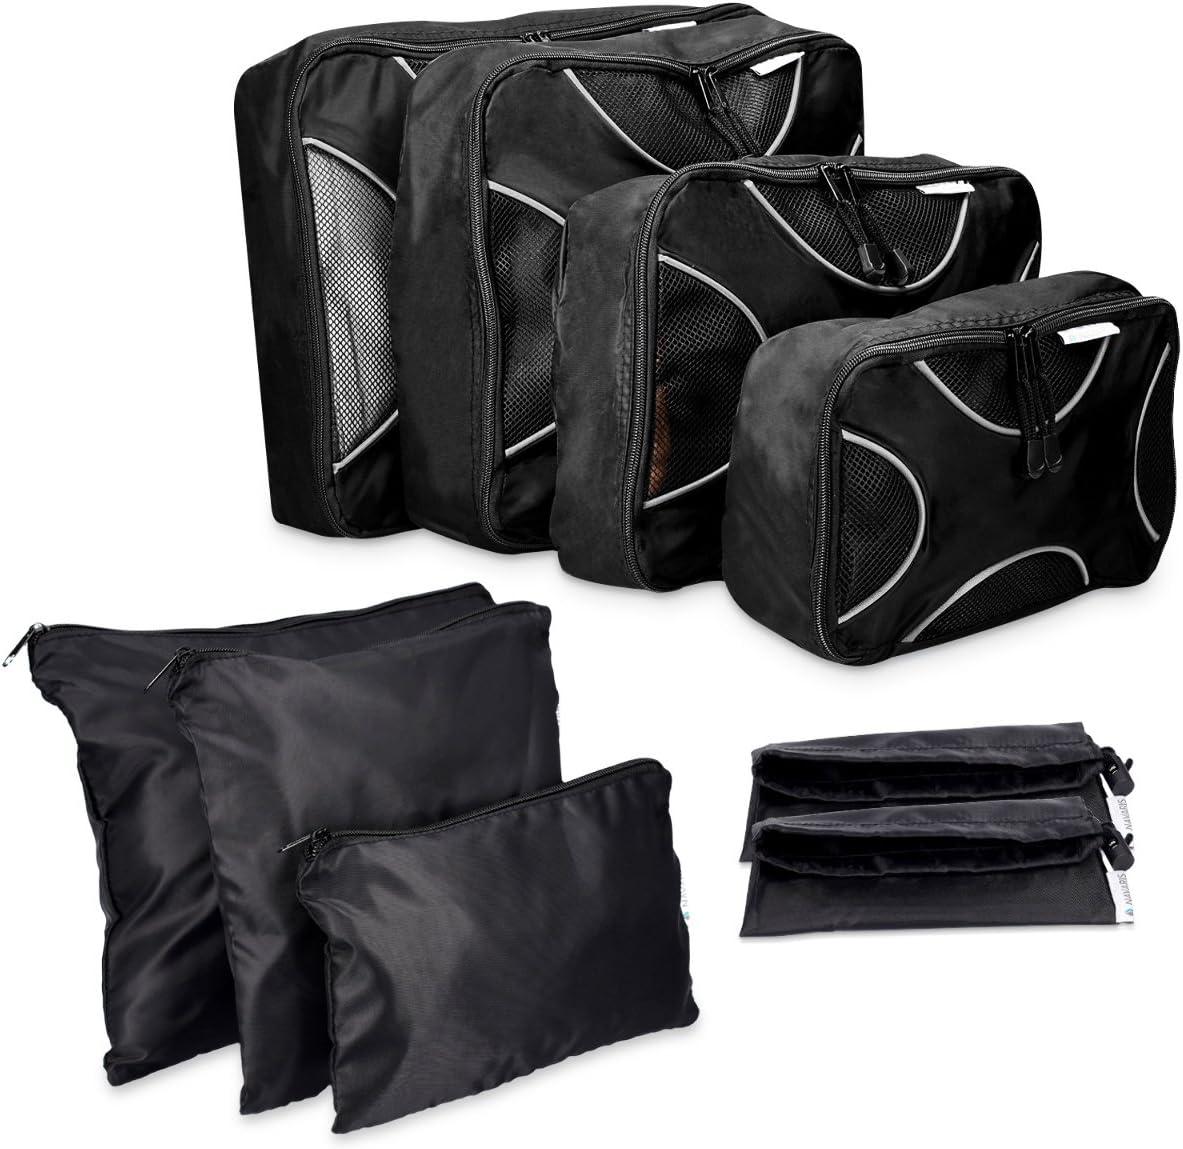 Navaris Set de 9 organizadores de Maleta - 4X Bolsas de Viaje para Ropa Zapatos - Organizador de Equipaje de Nylon - Packing Cubes Blanco y Negro